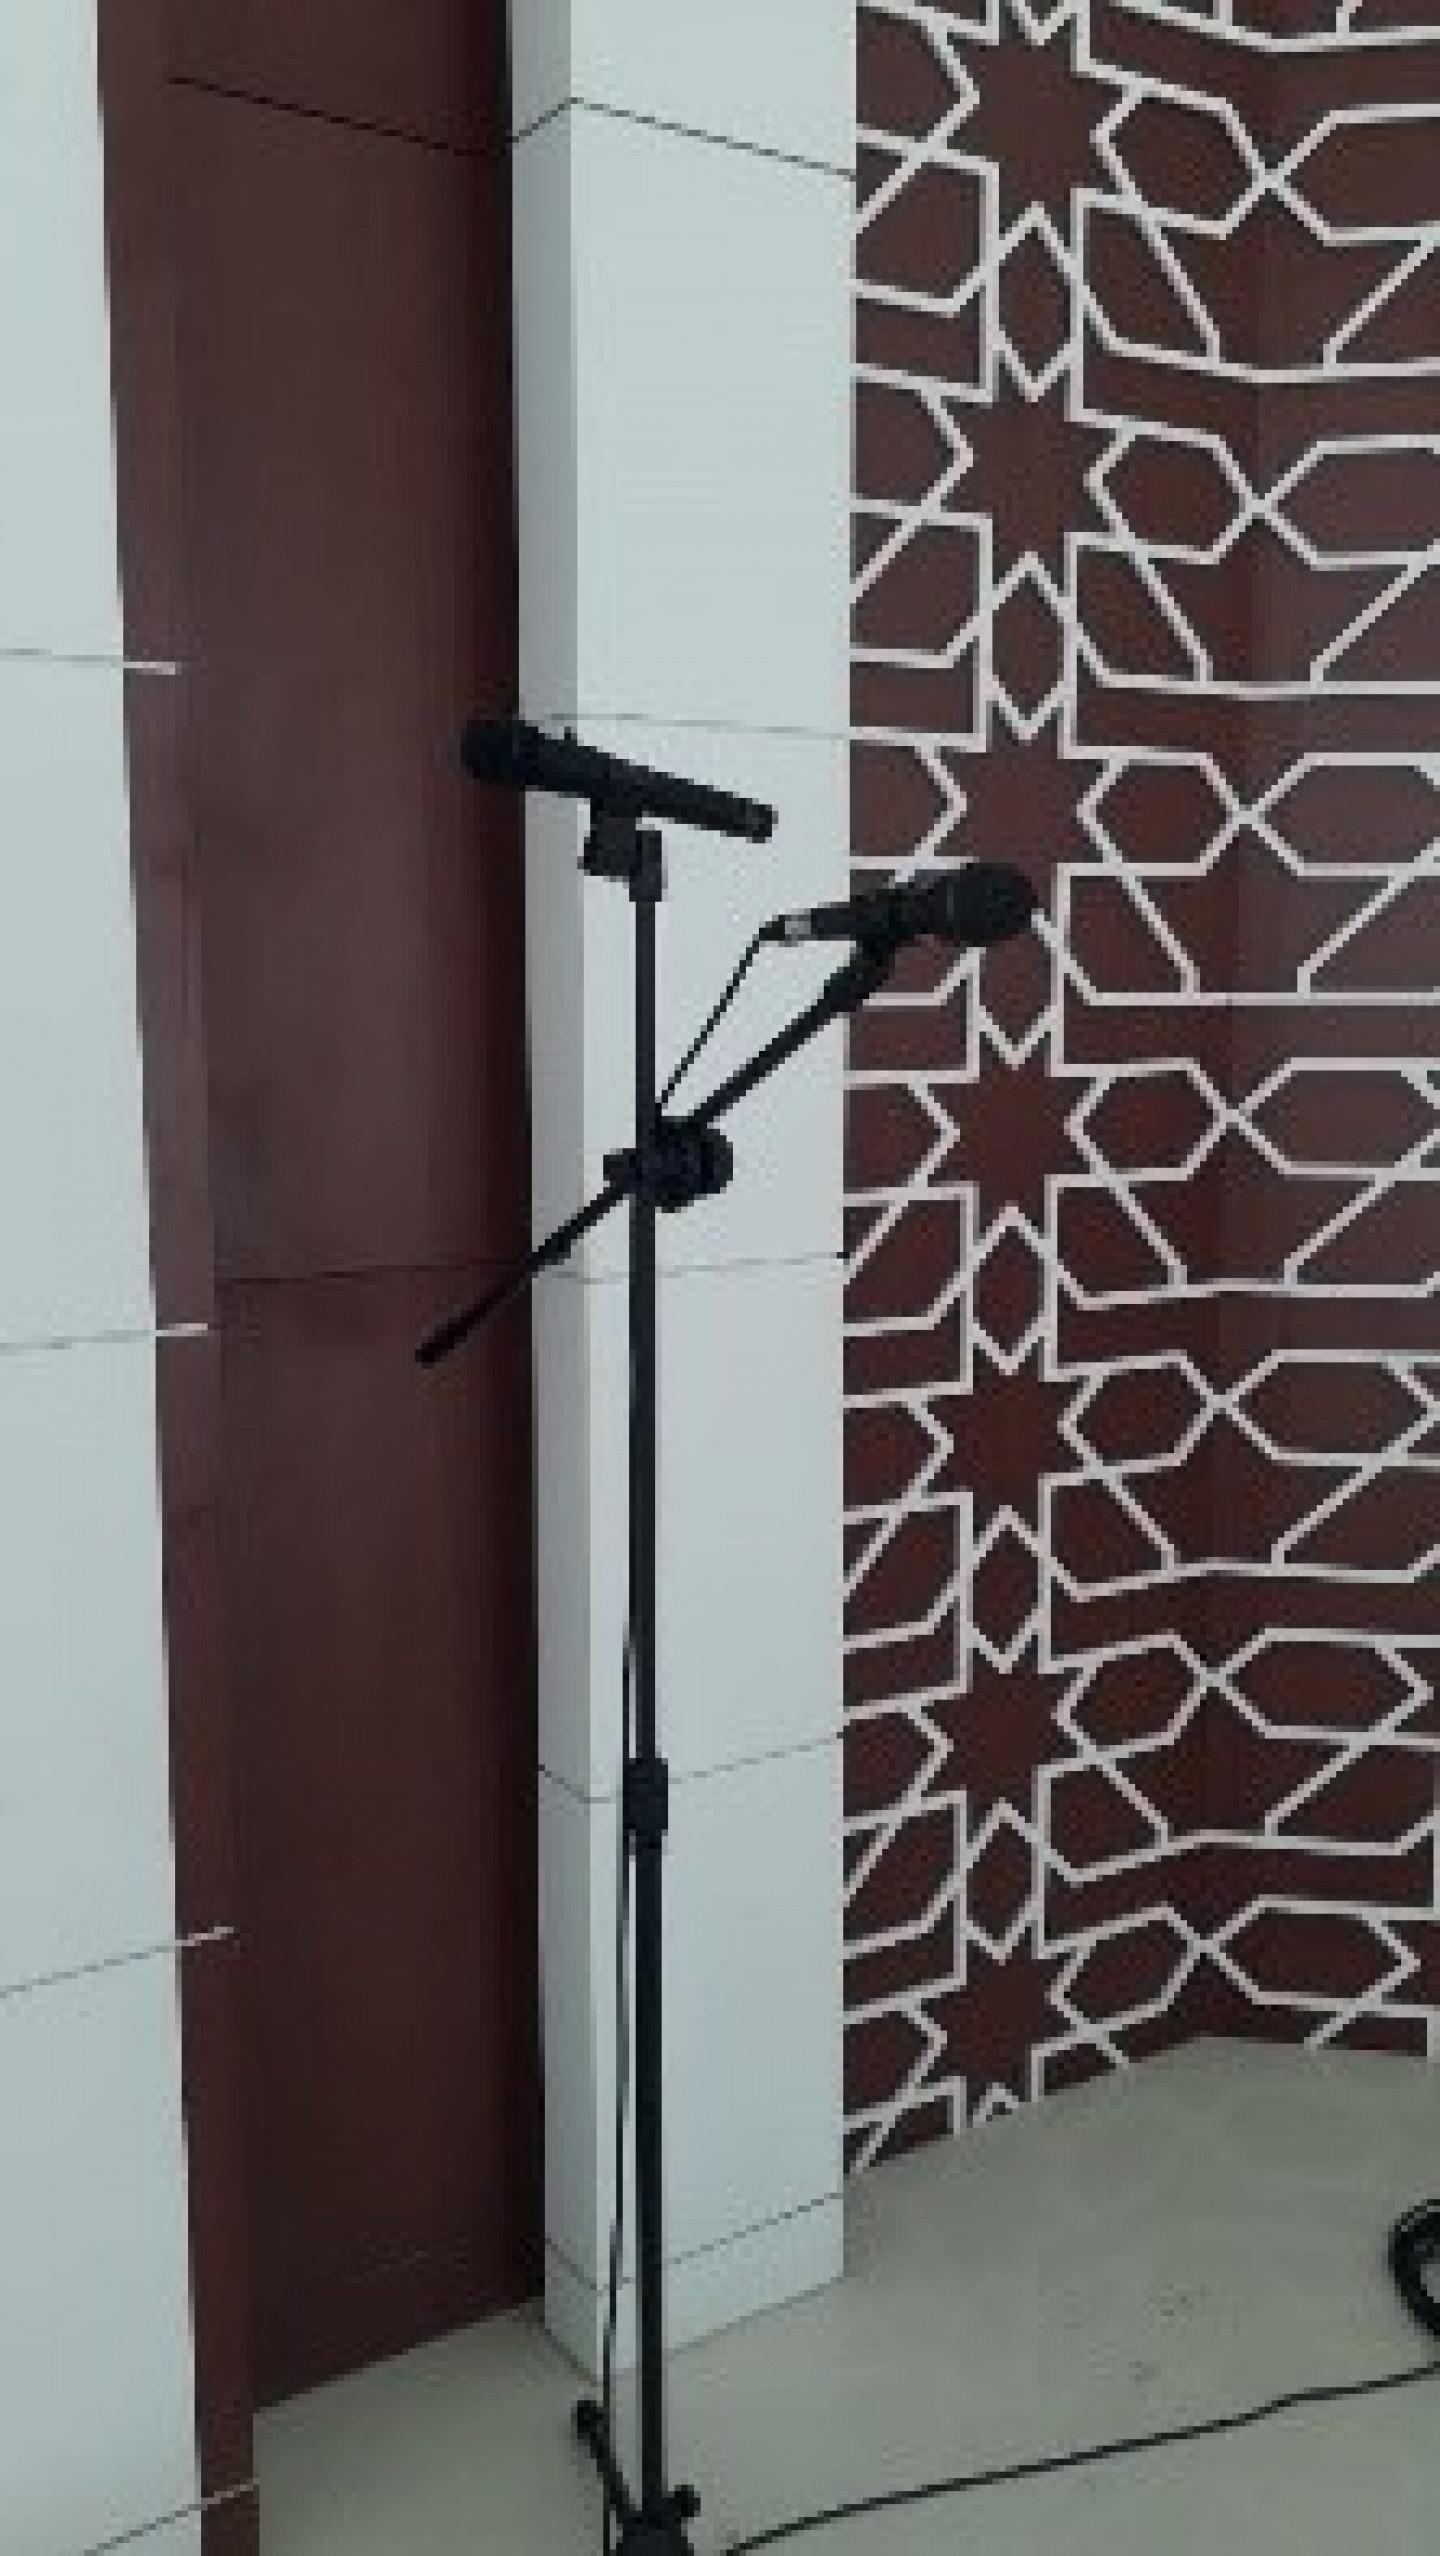 TOA Public Address System at Yogyakarta International Airport